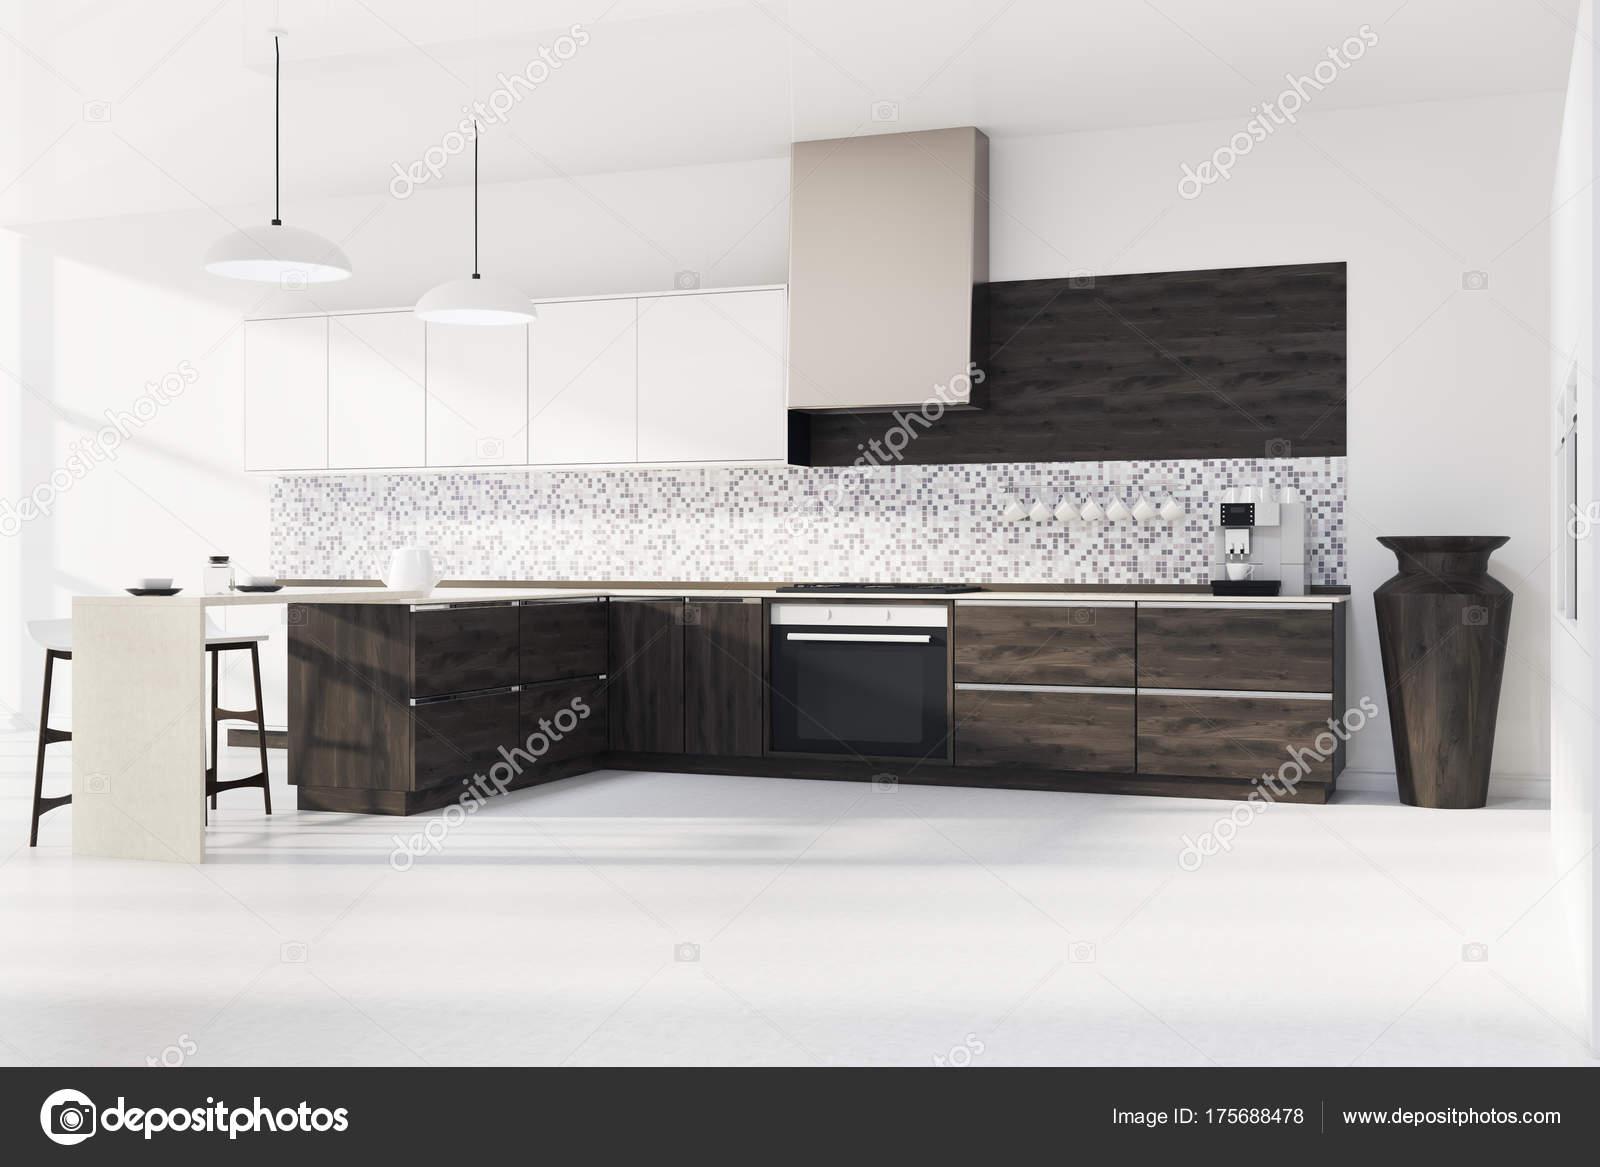 Mosaik-Küche, Vase, Seite — Stockfoto © denisismagilov #175688478